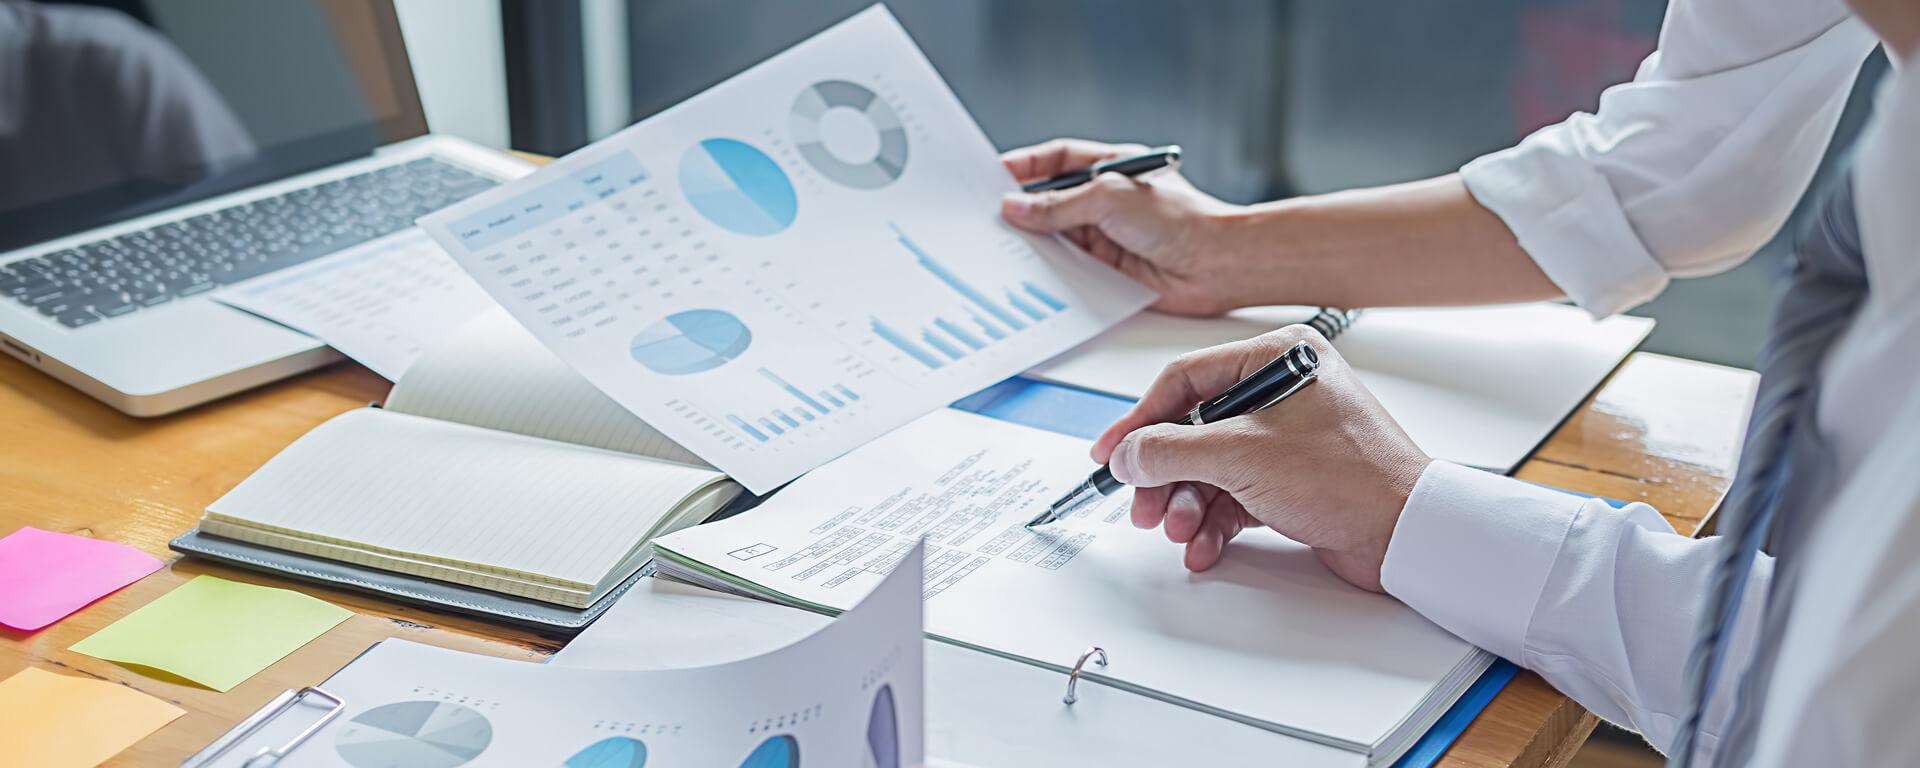 Audits internes et de conformité radioprotection